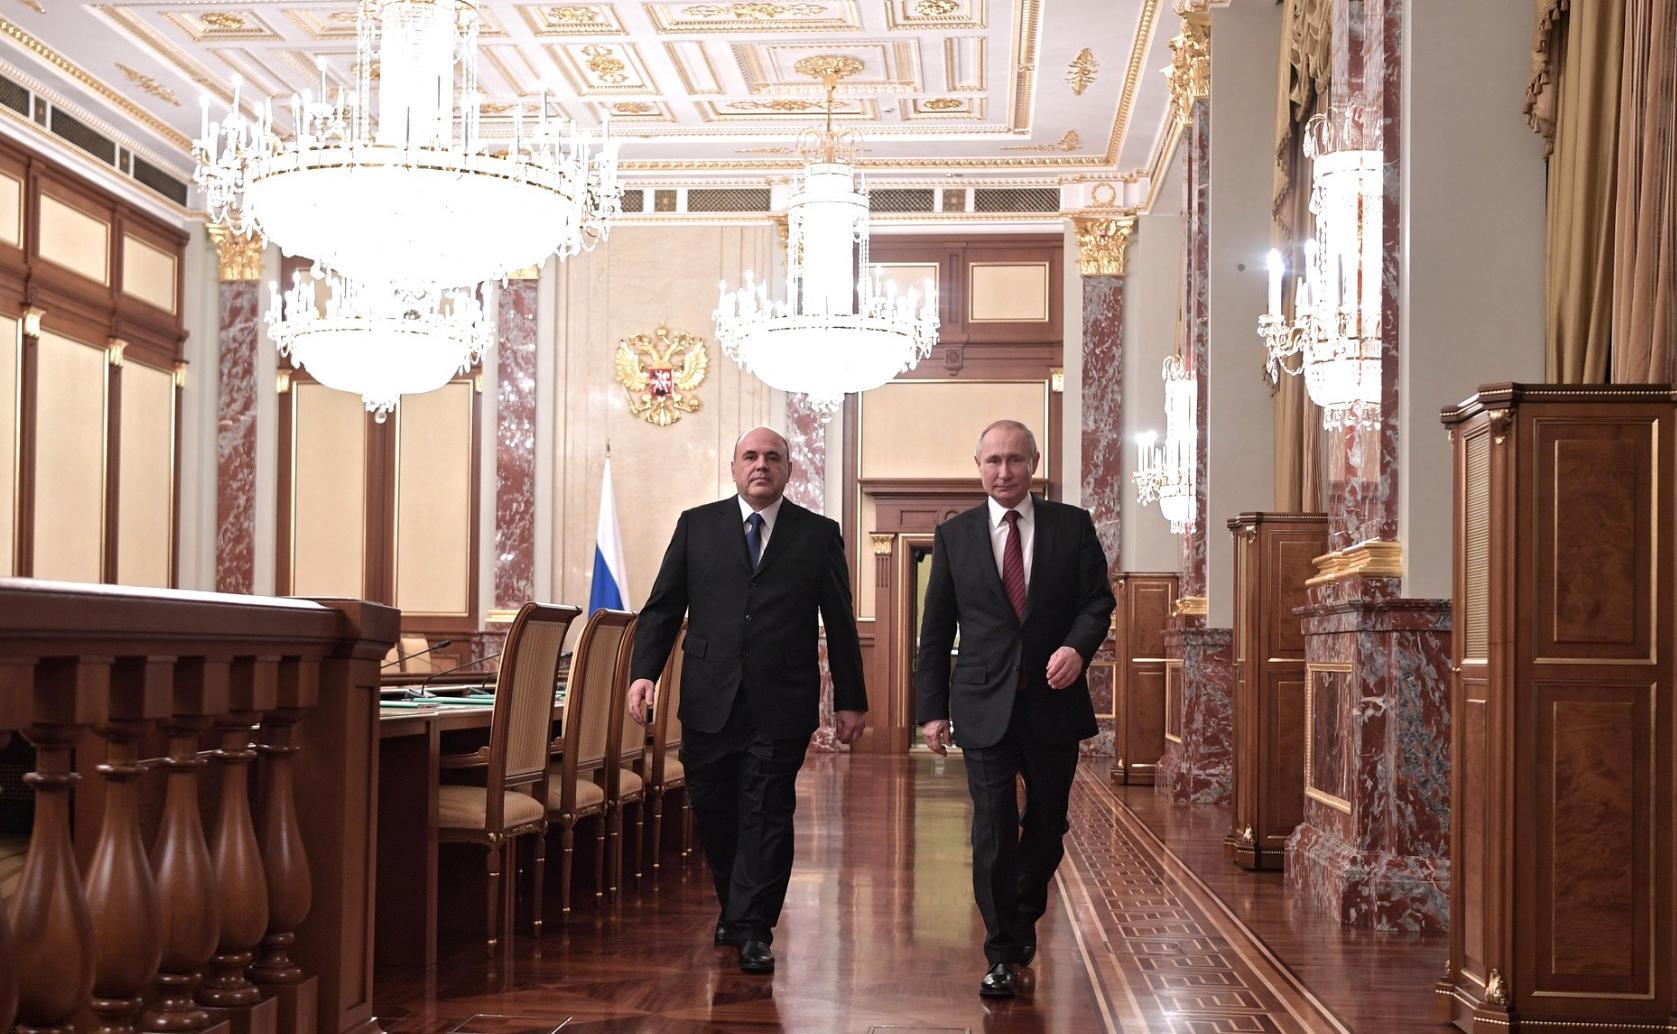 "<p>Фото © <a href=""http://kremlin.ru/events/president/news/62626/photos"" target=""_blank"" rel=""noopener noreferrer"">Администрация Президента России</a></p>"